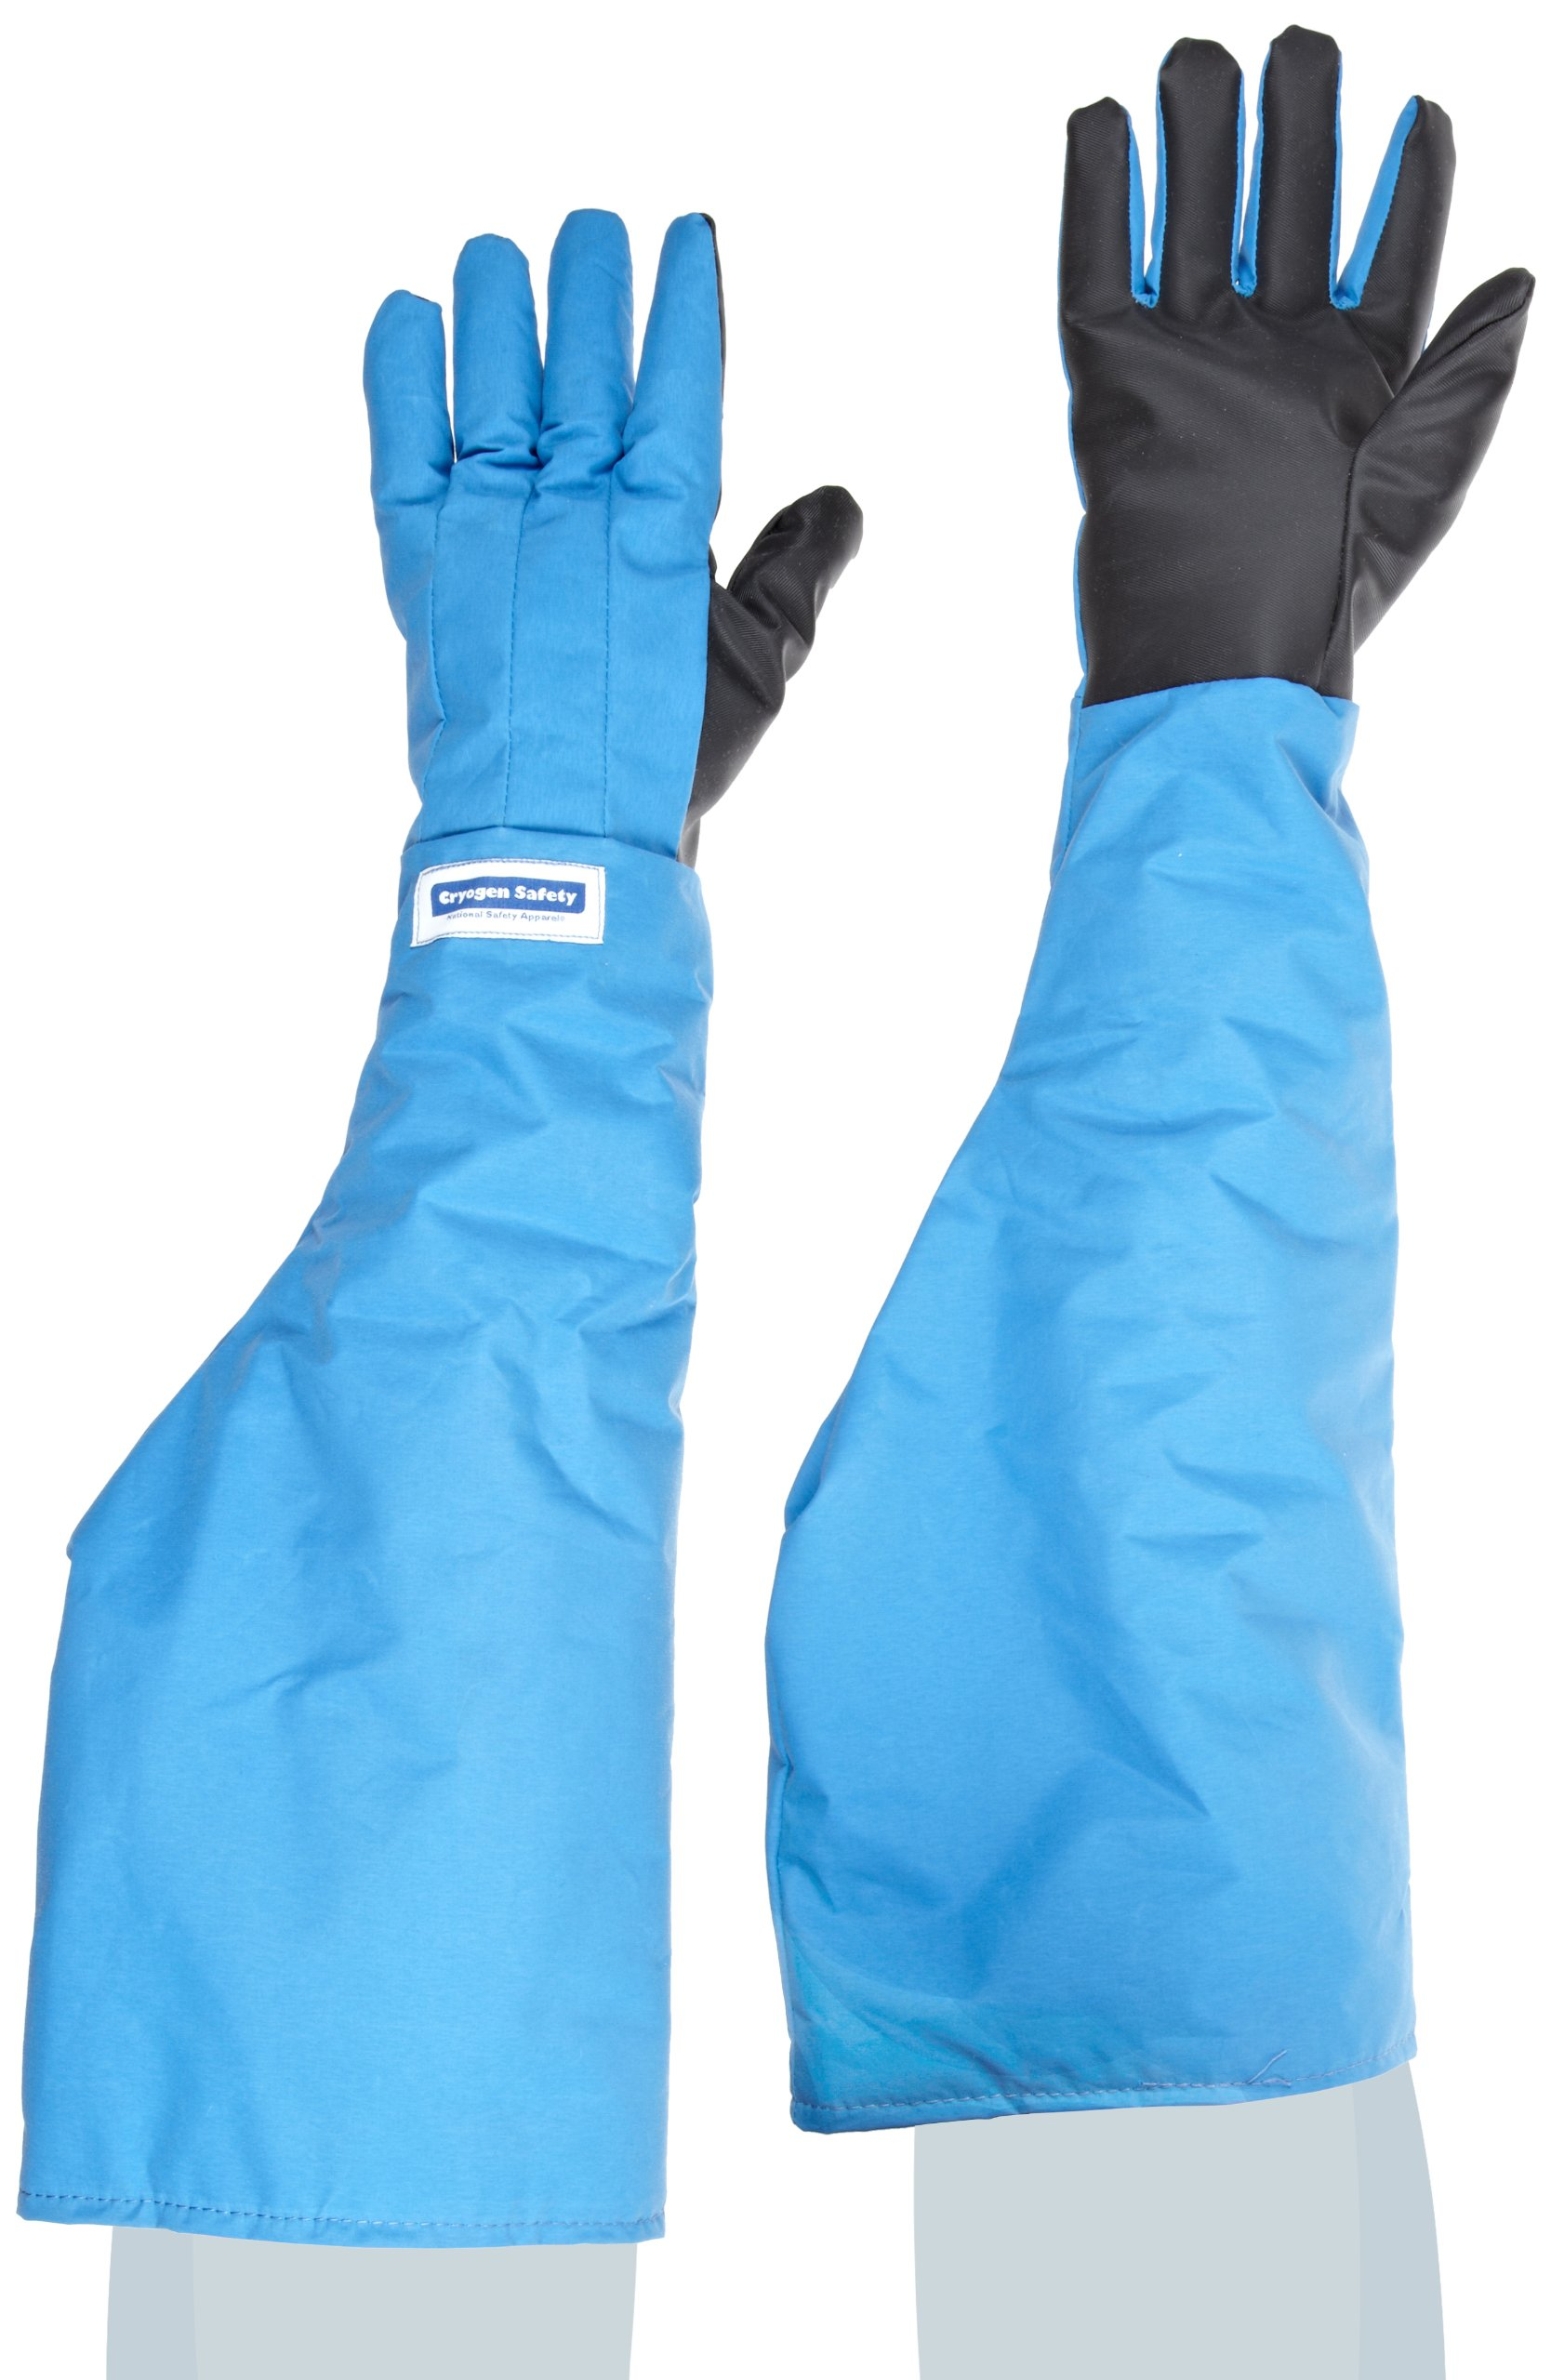 National Safety Apparel G99CRSGPMDSH Nylon Taslan and PTFE Shoulder Waterproof Safety Glove with SaferGrip Palm, Cryogenic, 26'' - 27'' Length, Medium, Blue